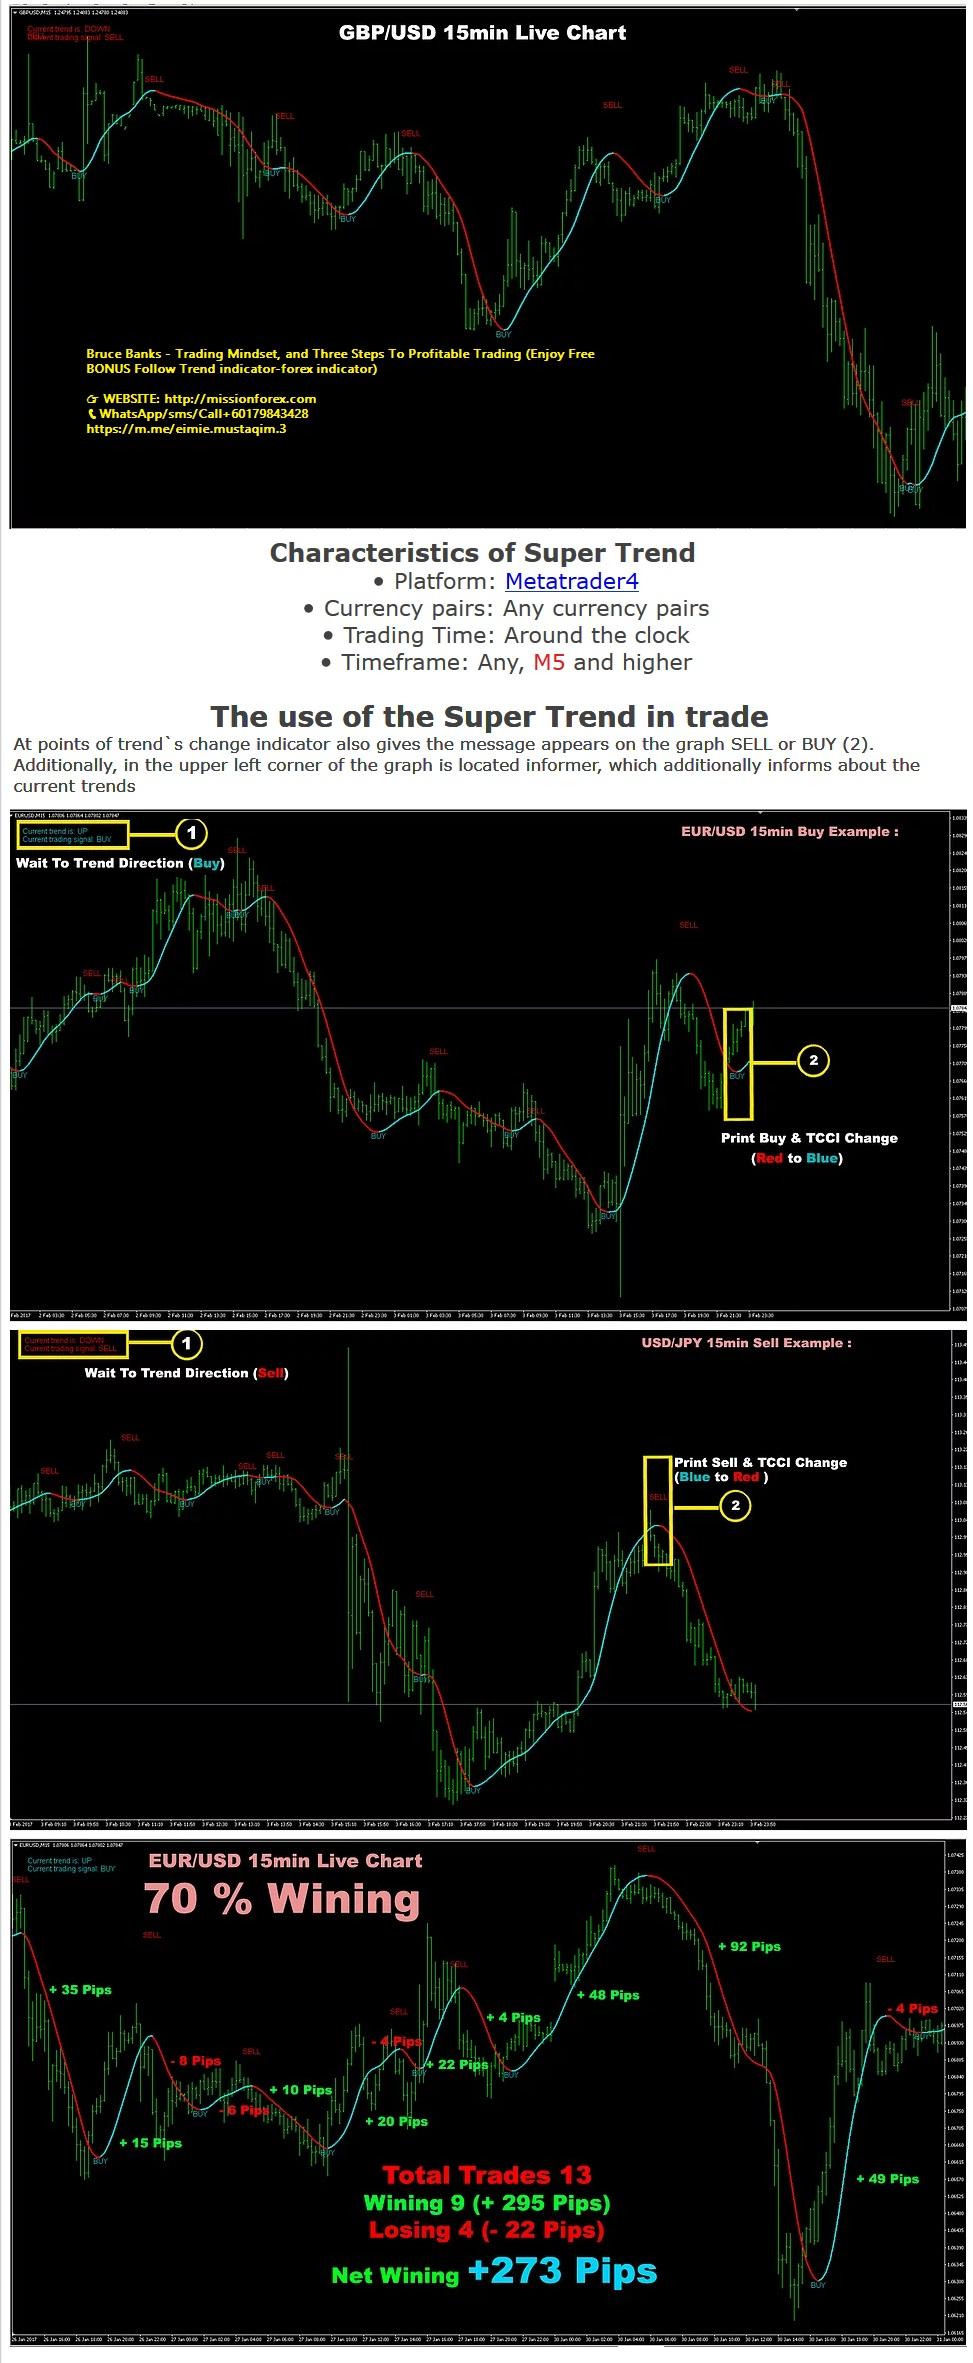 Bruce Banks - Trading Mindset, and Three Steps To Profitable Trading (Enjoy Free BONUS Follow Trend indicator-forex indicator)